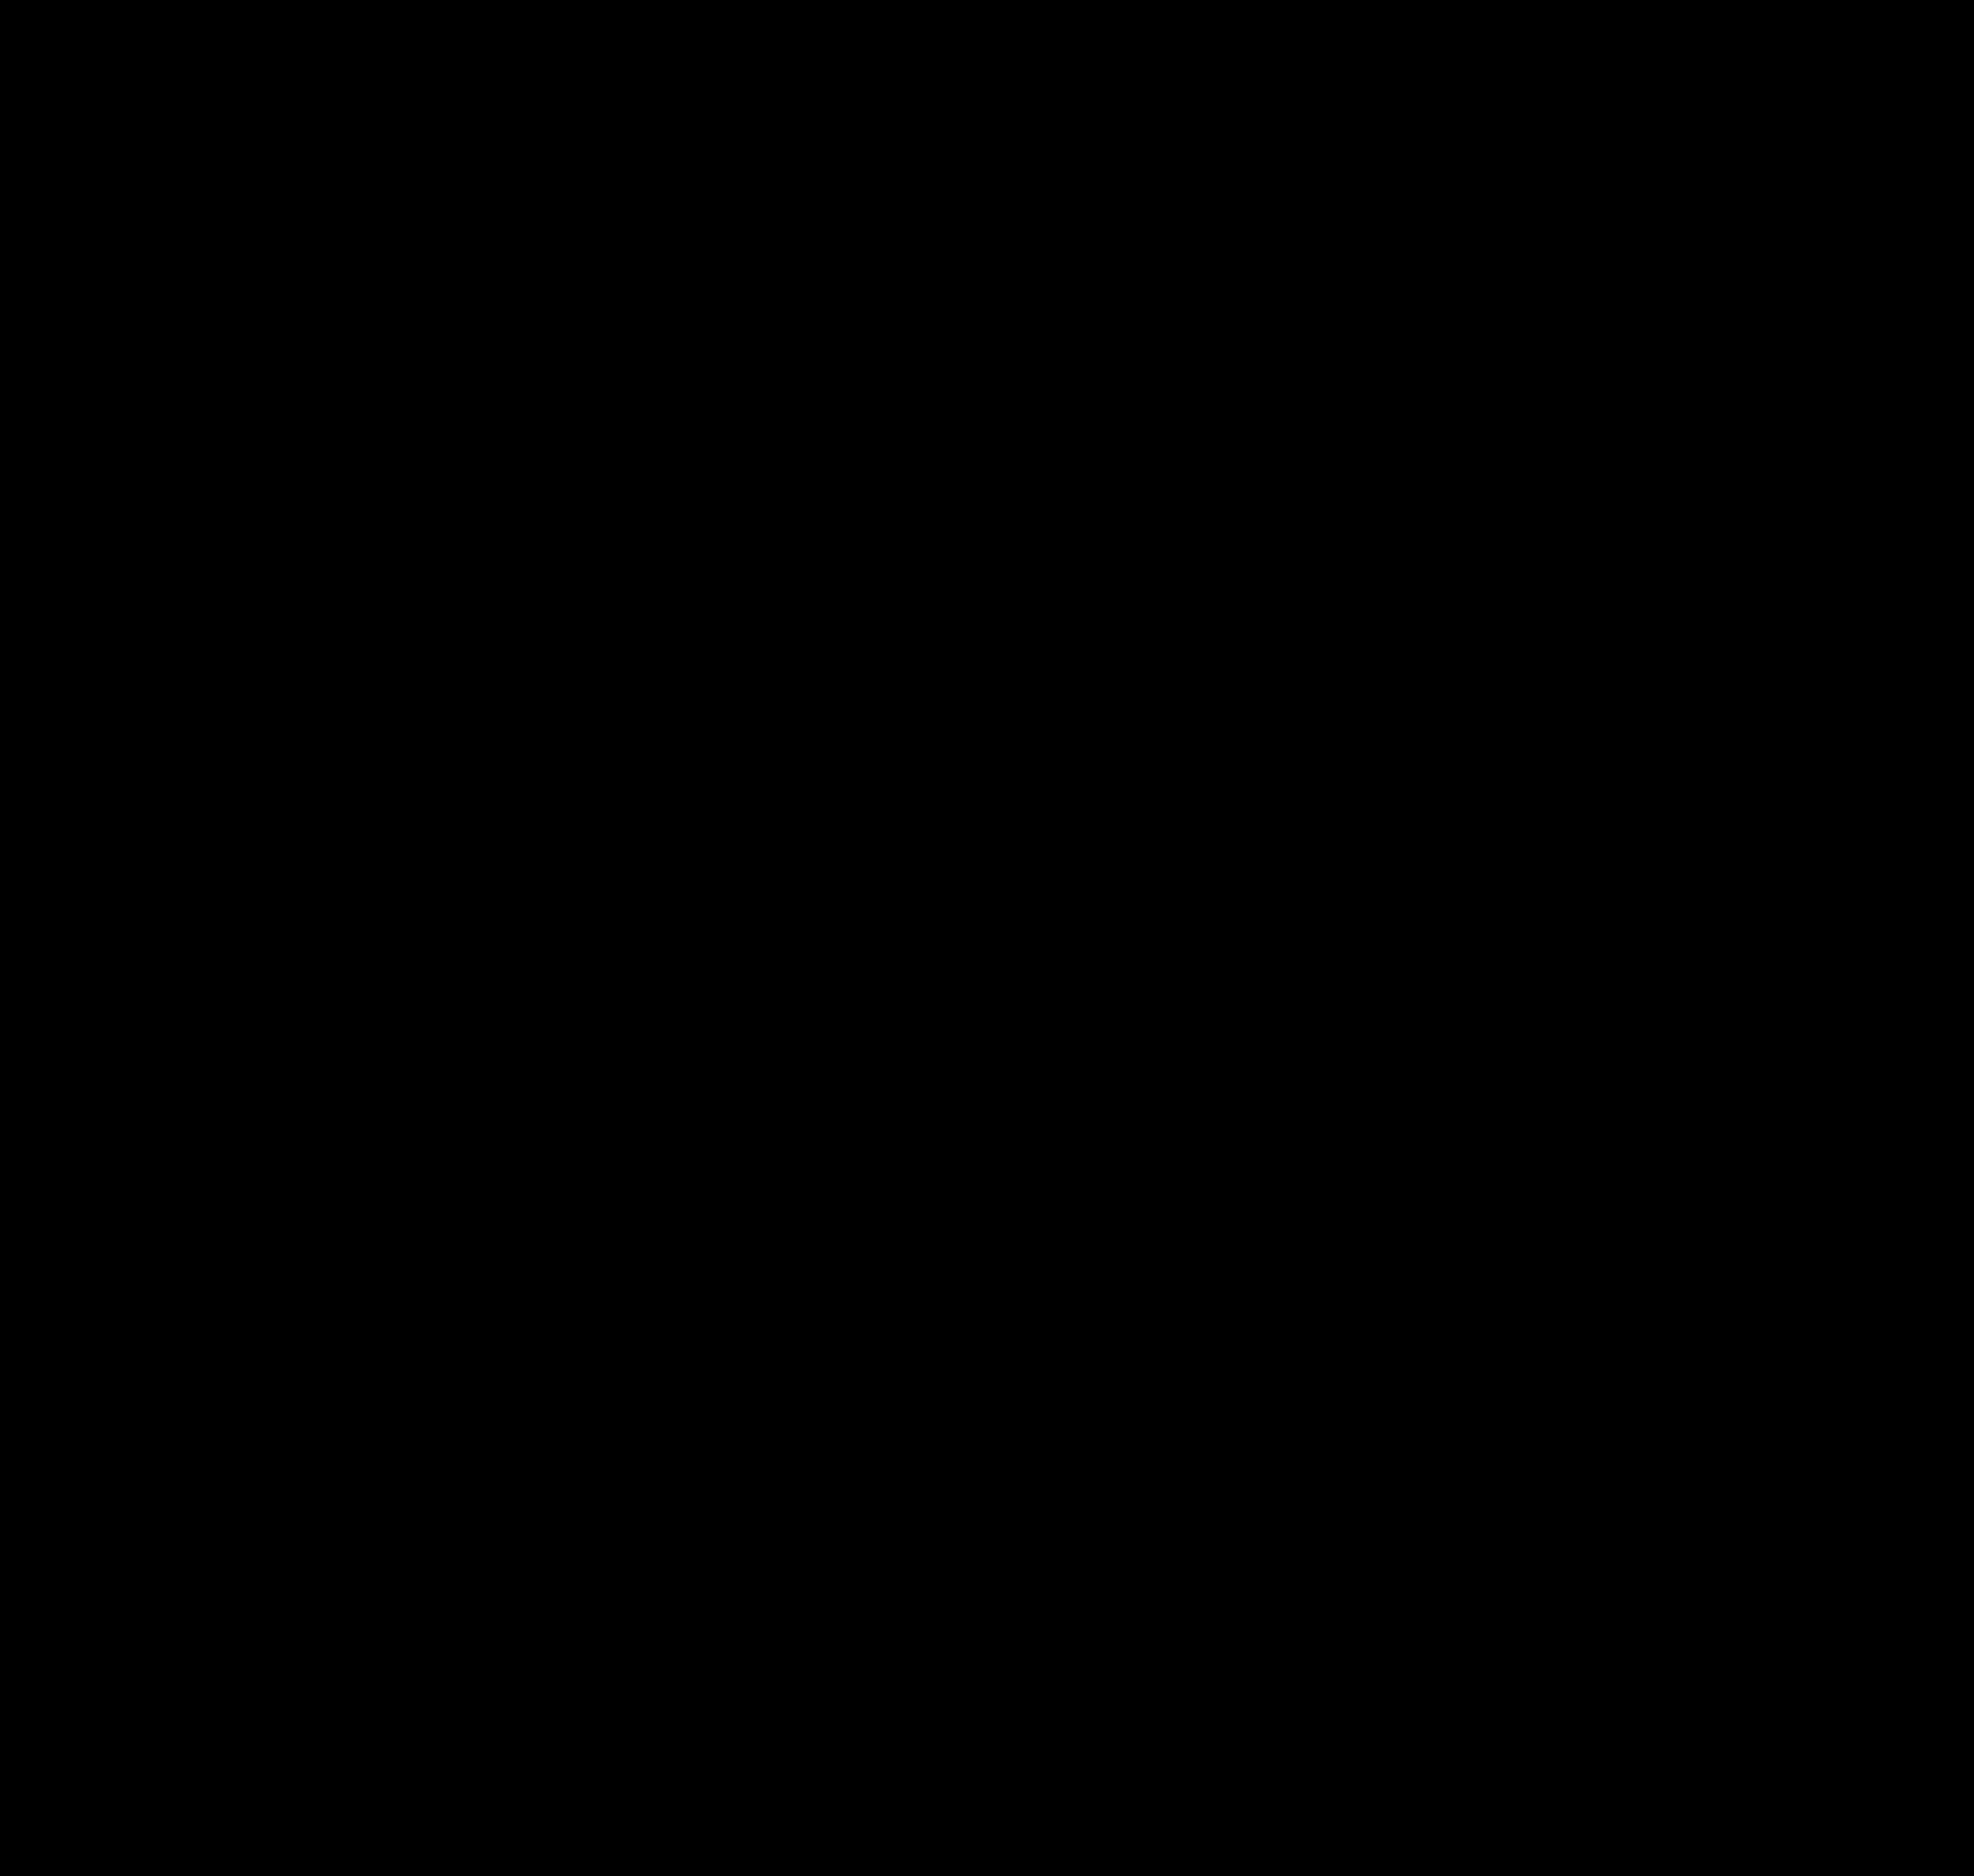 Pin Umbrella Clipart Black N White #5 - Seven Black And White, Transparent background PNG HD thumbnail